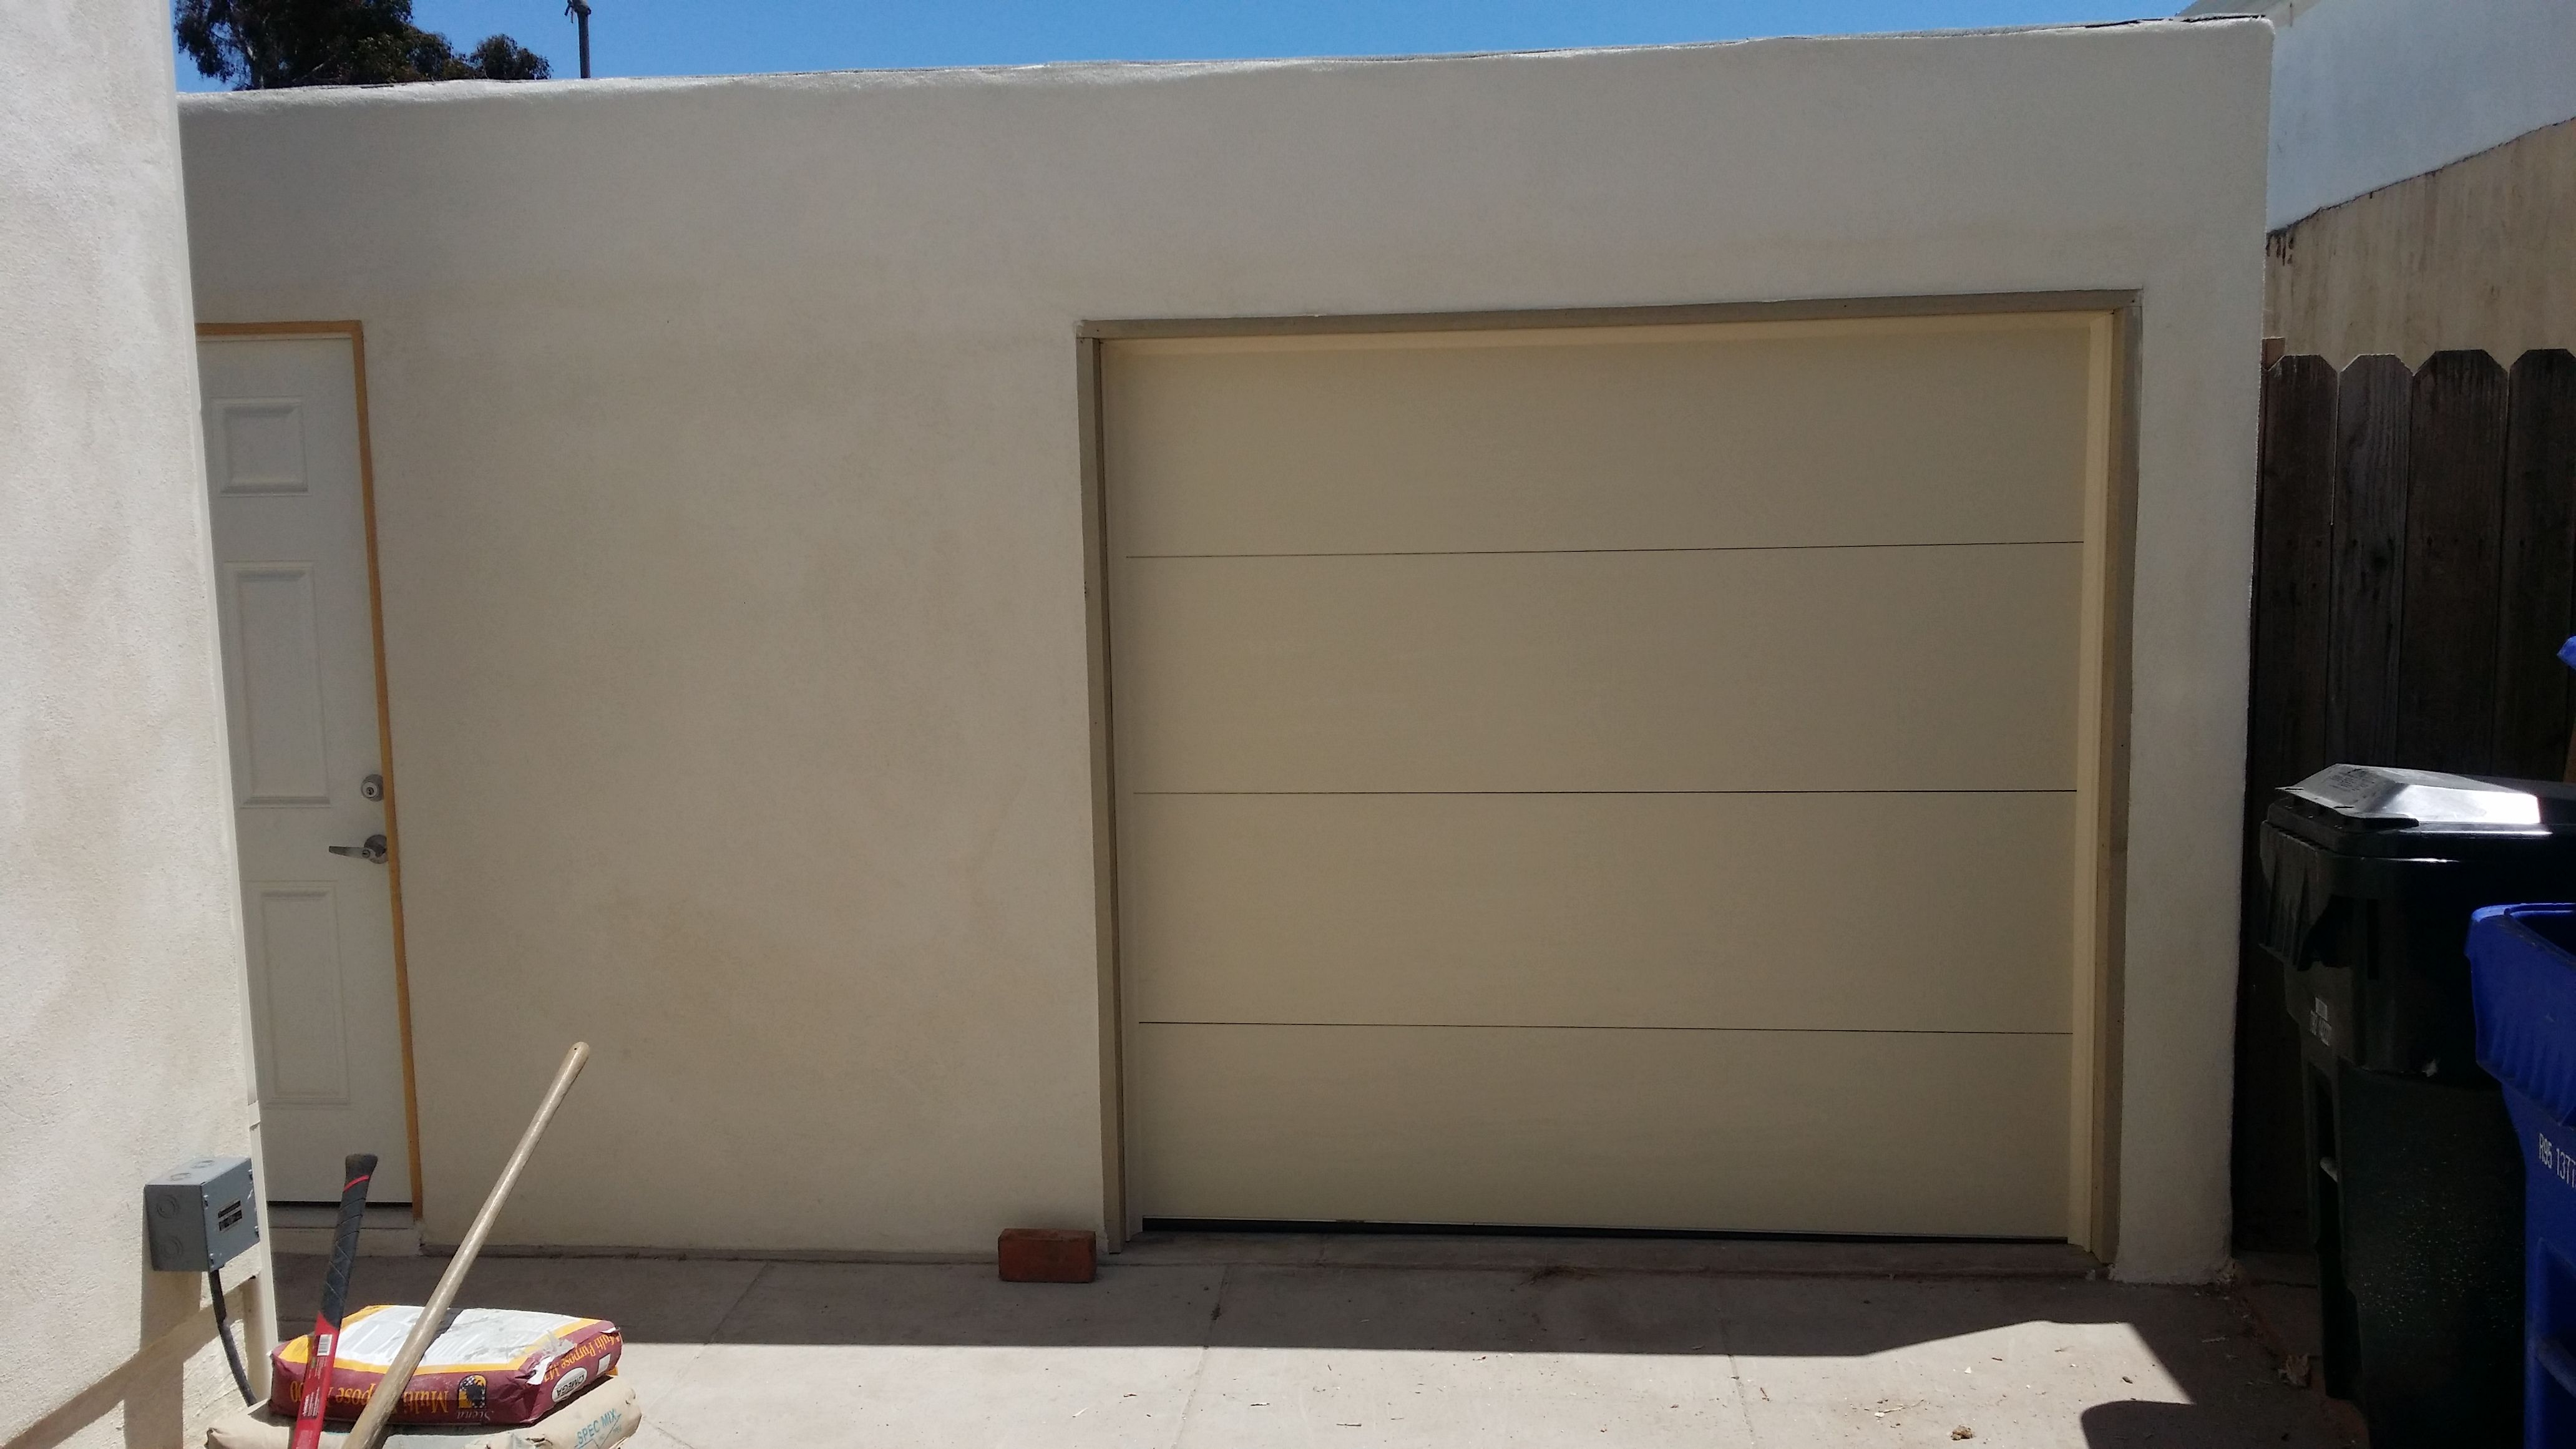 Single car garage door by Mark Christopher in San Diego 888.870.4677